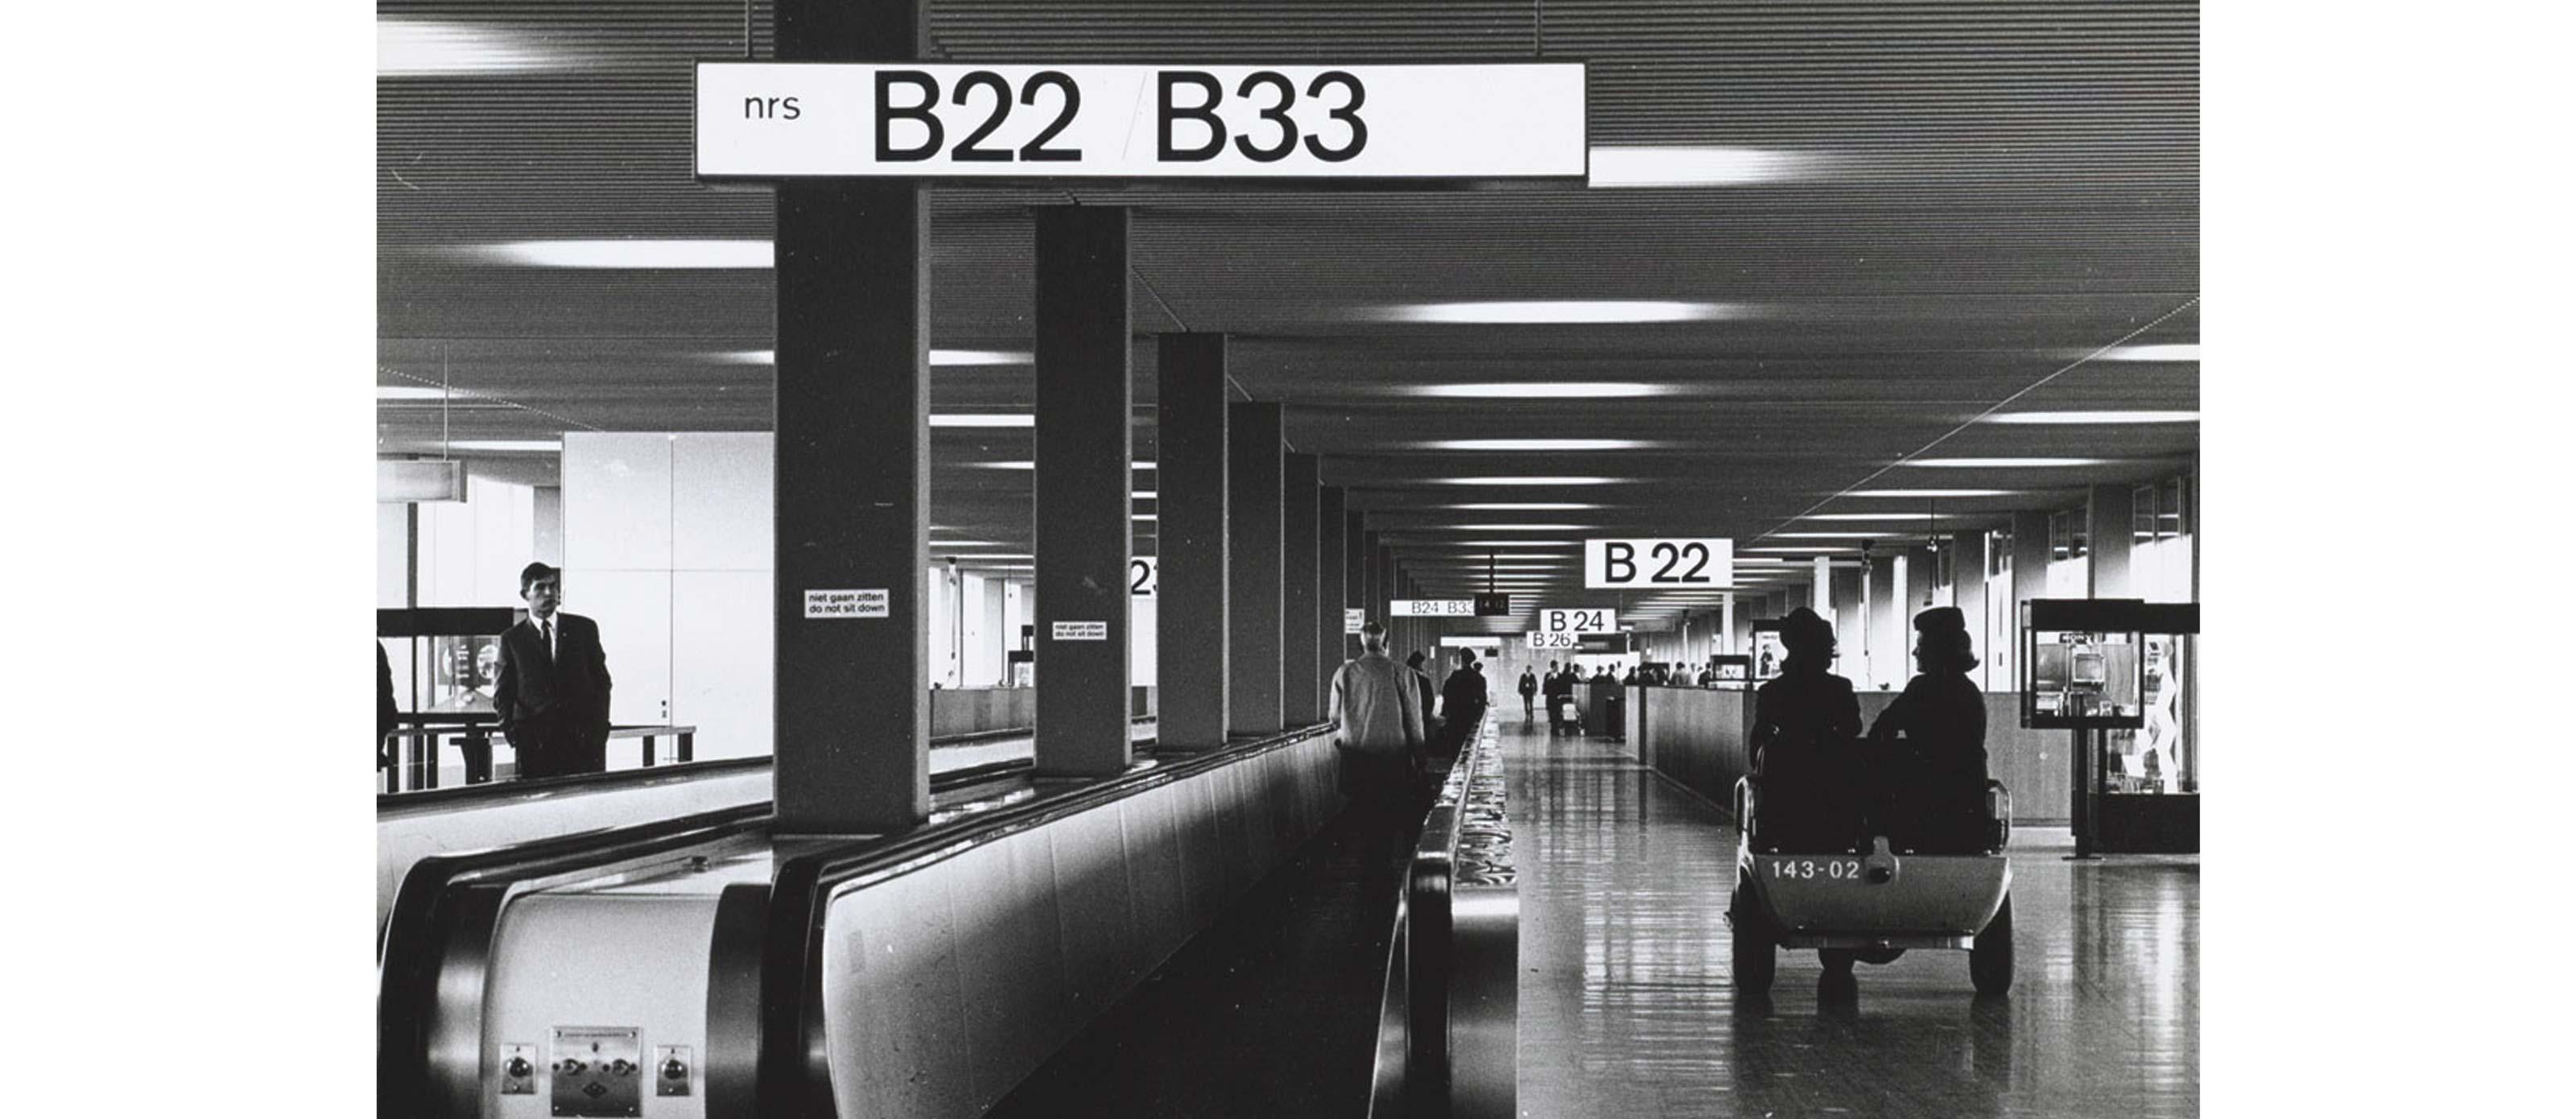 benno-wissing-signaletique-aeroport-schiphol-1967-01